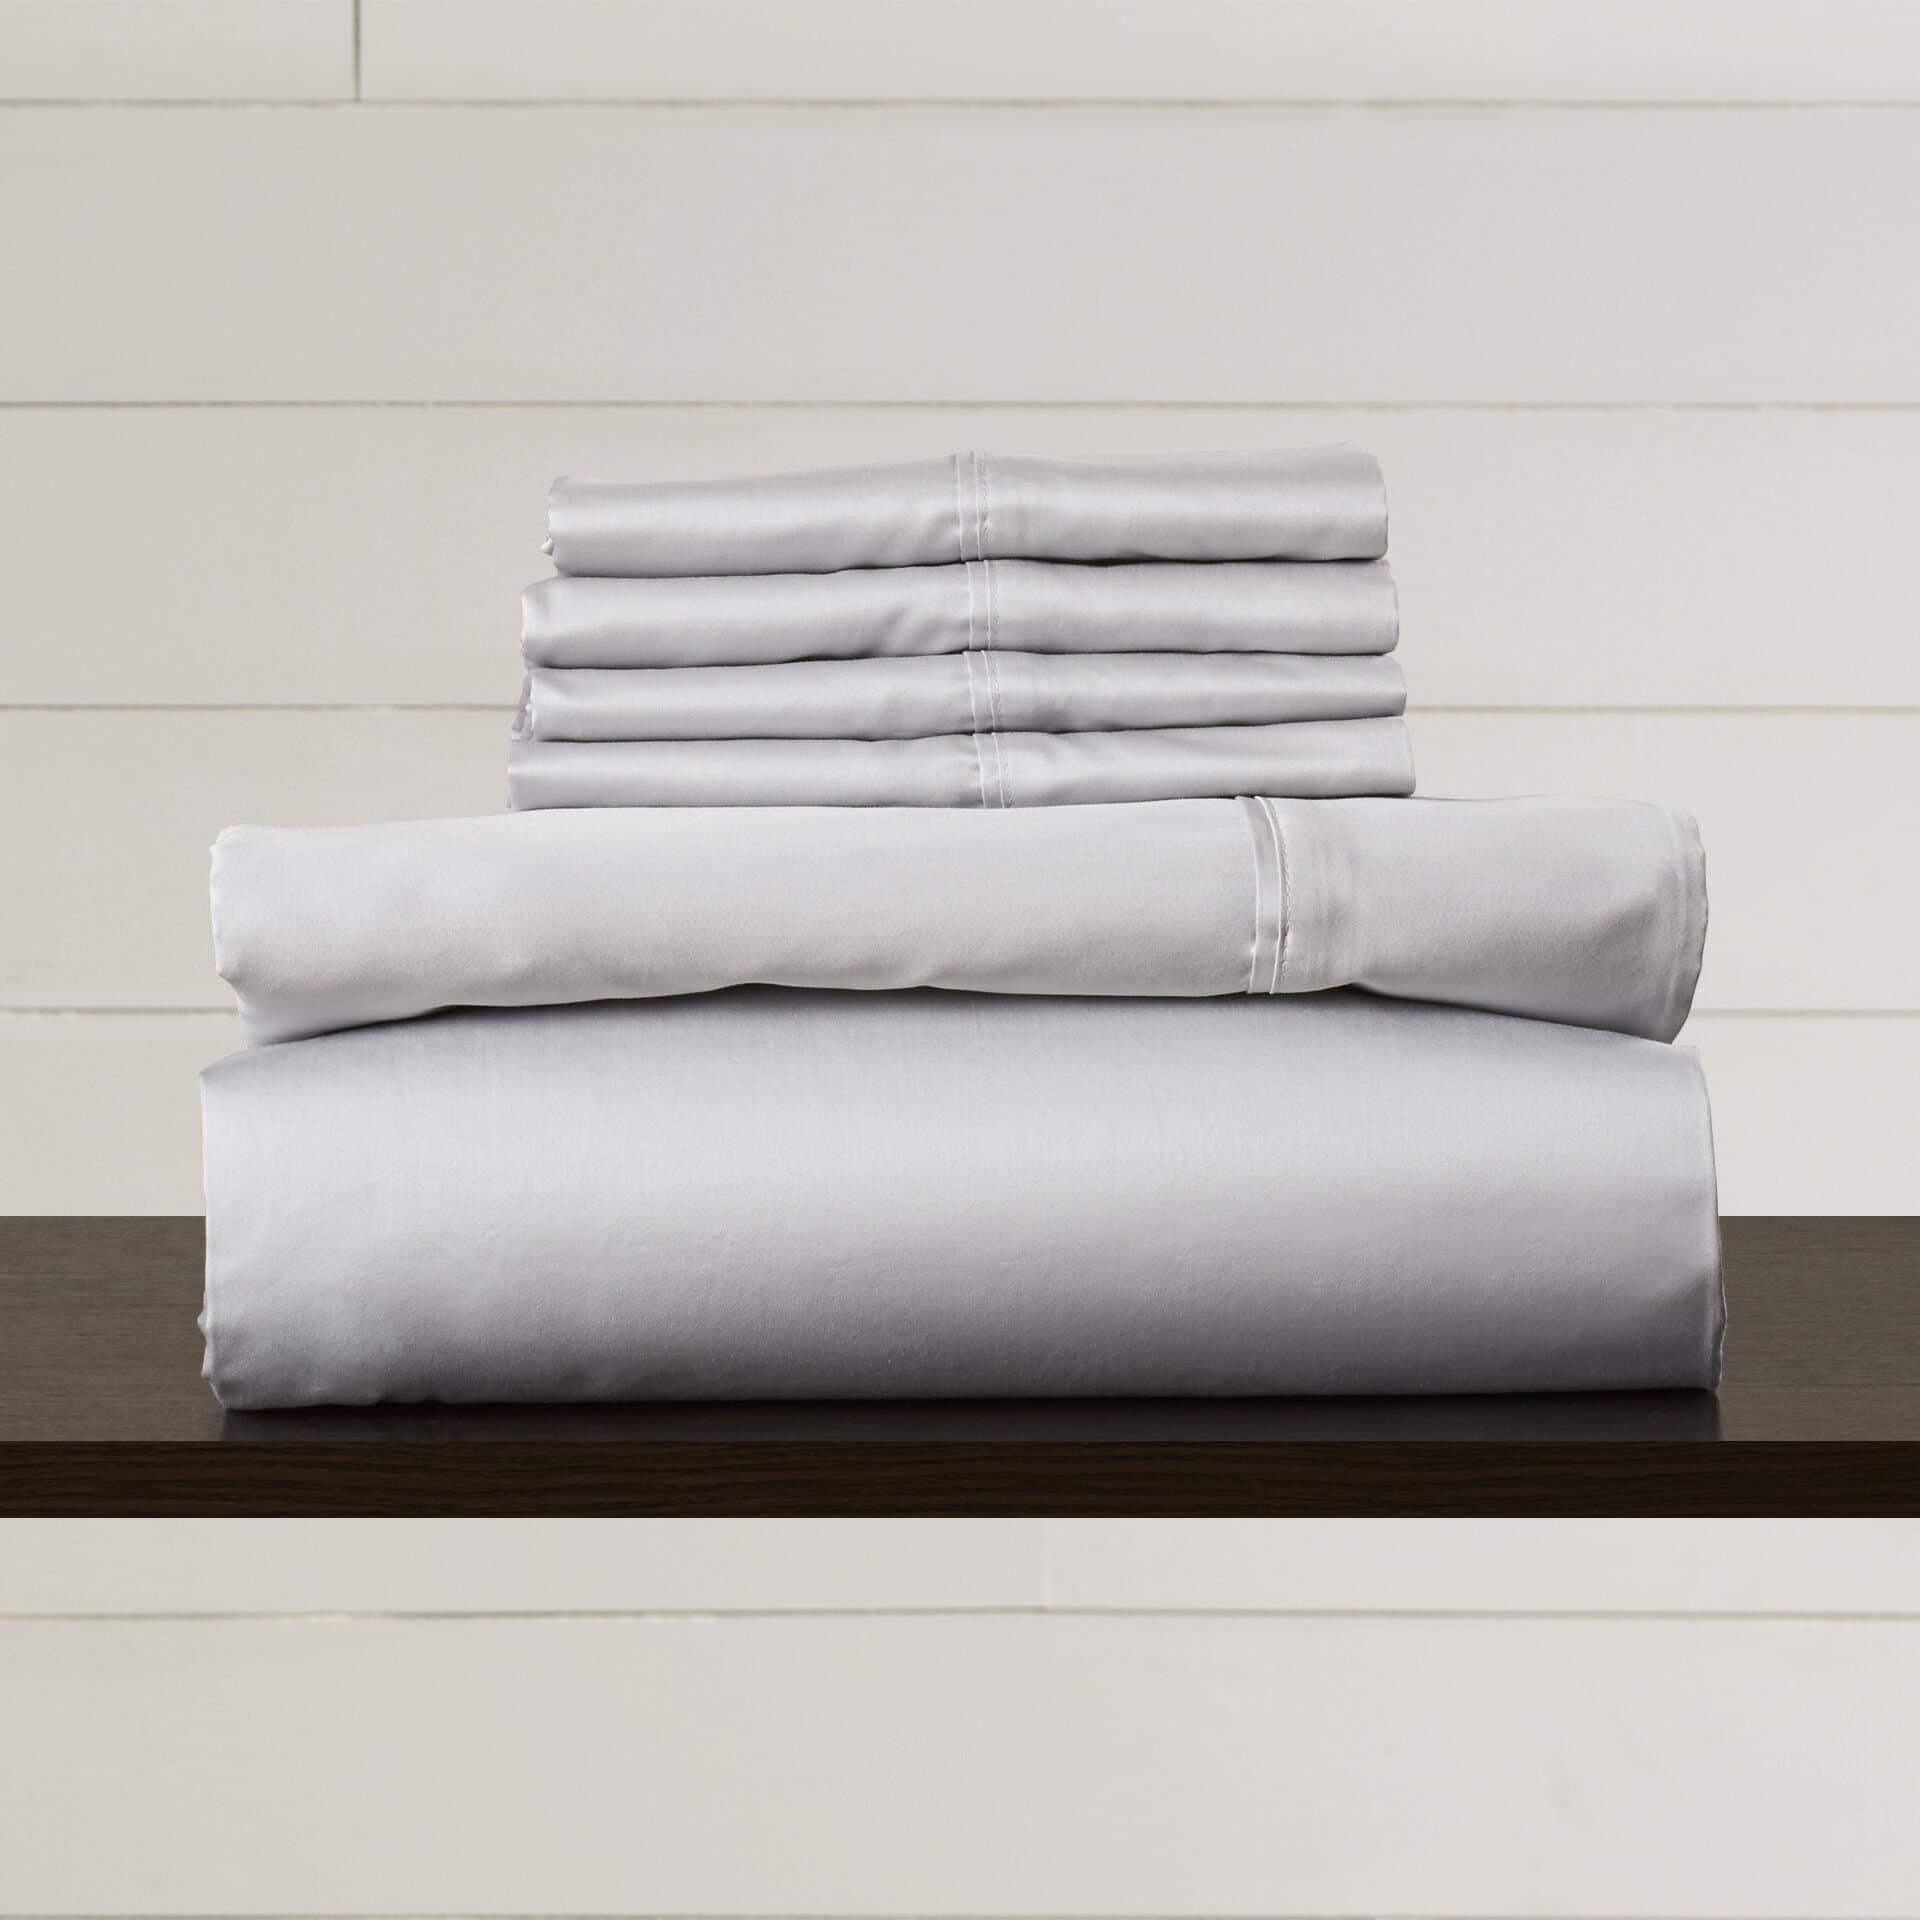 nicoli 600 thread count 6 piece egyptian quality cotton sateen deep pocket sheet set